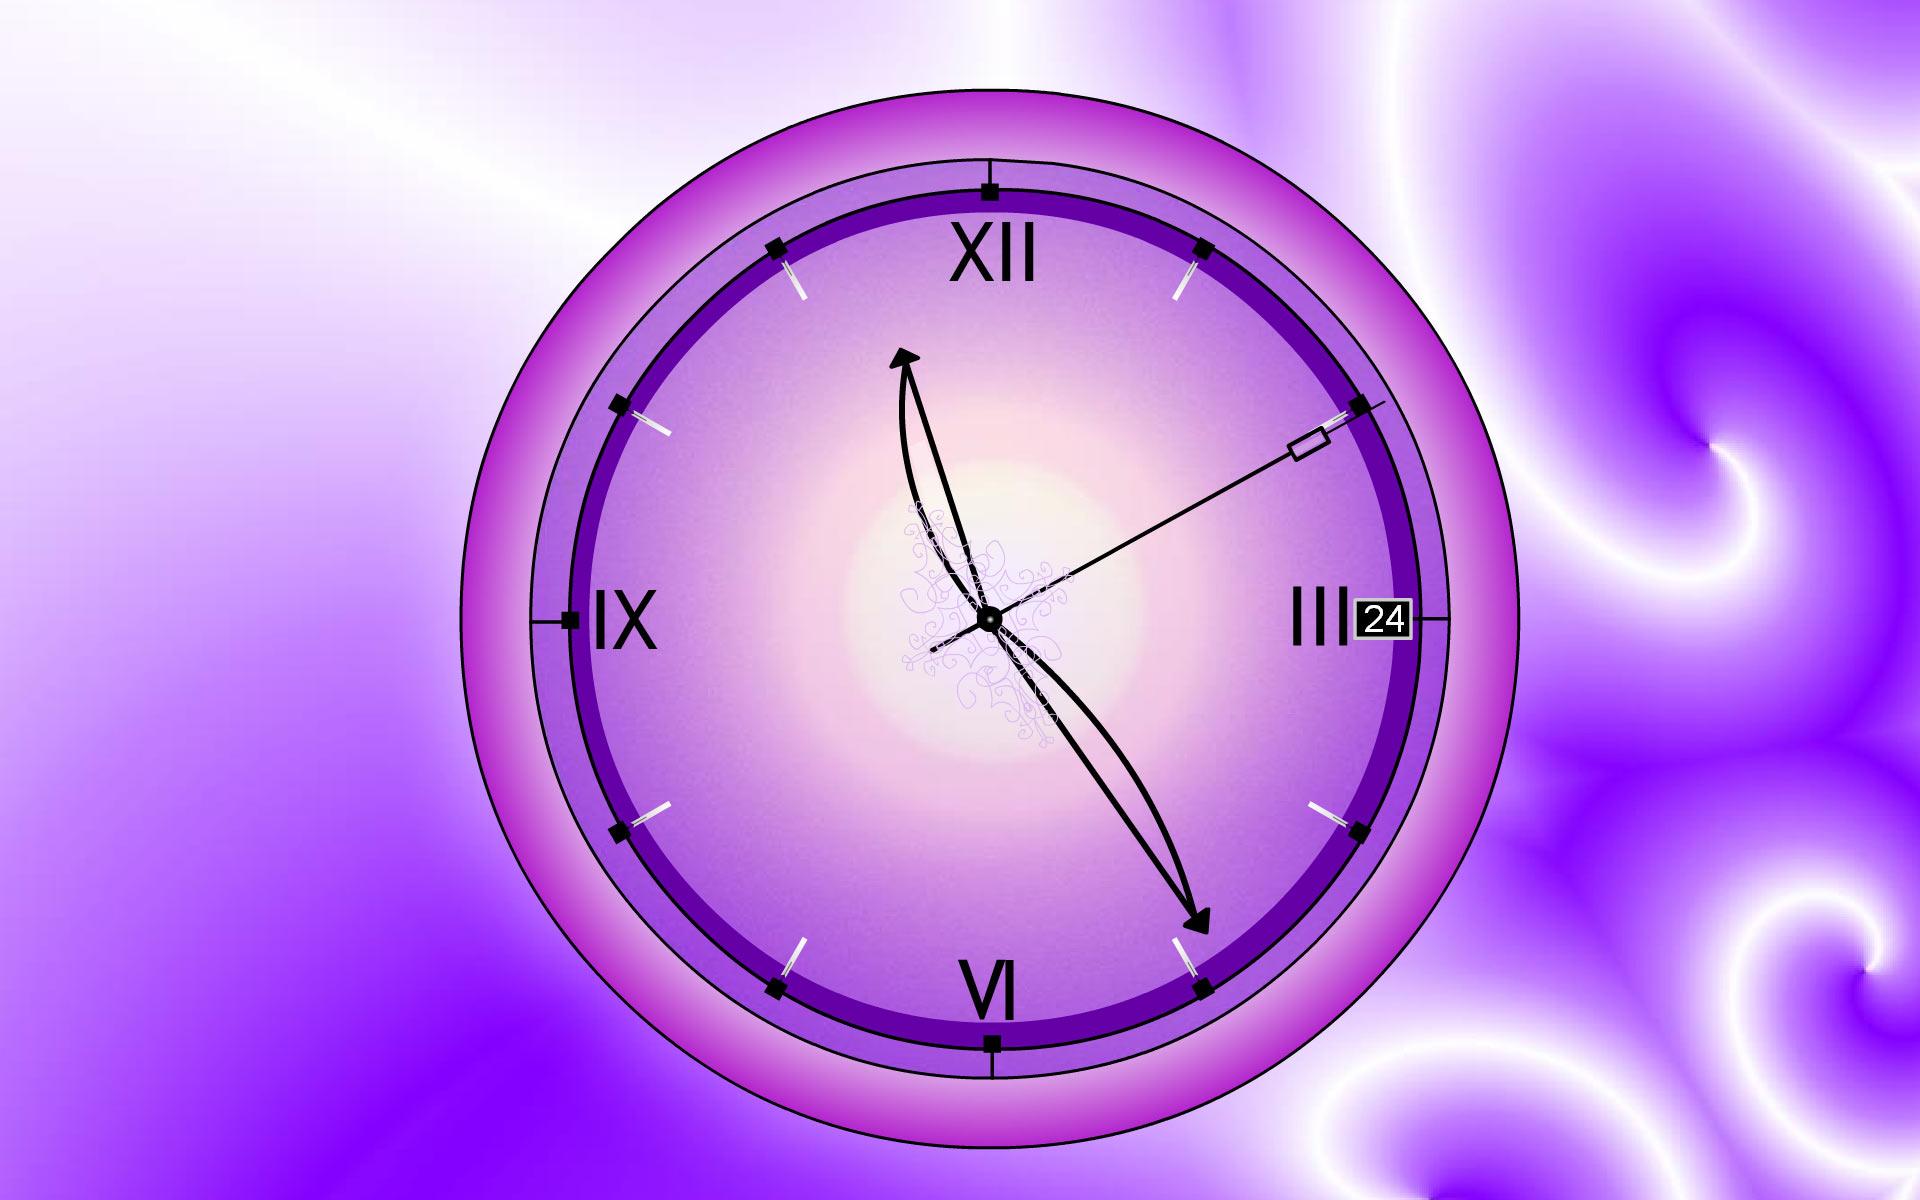 free download lacy clock live wallpaper lacy clock screensaver 1920x1200